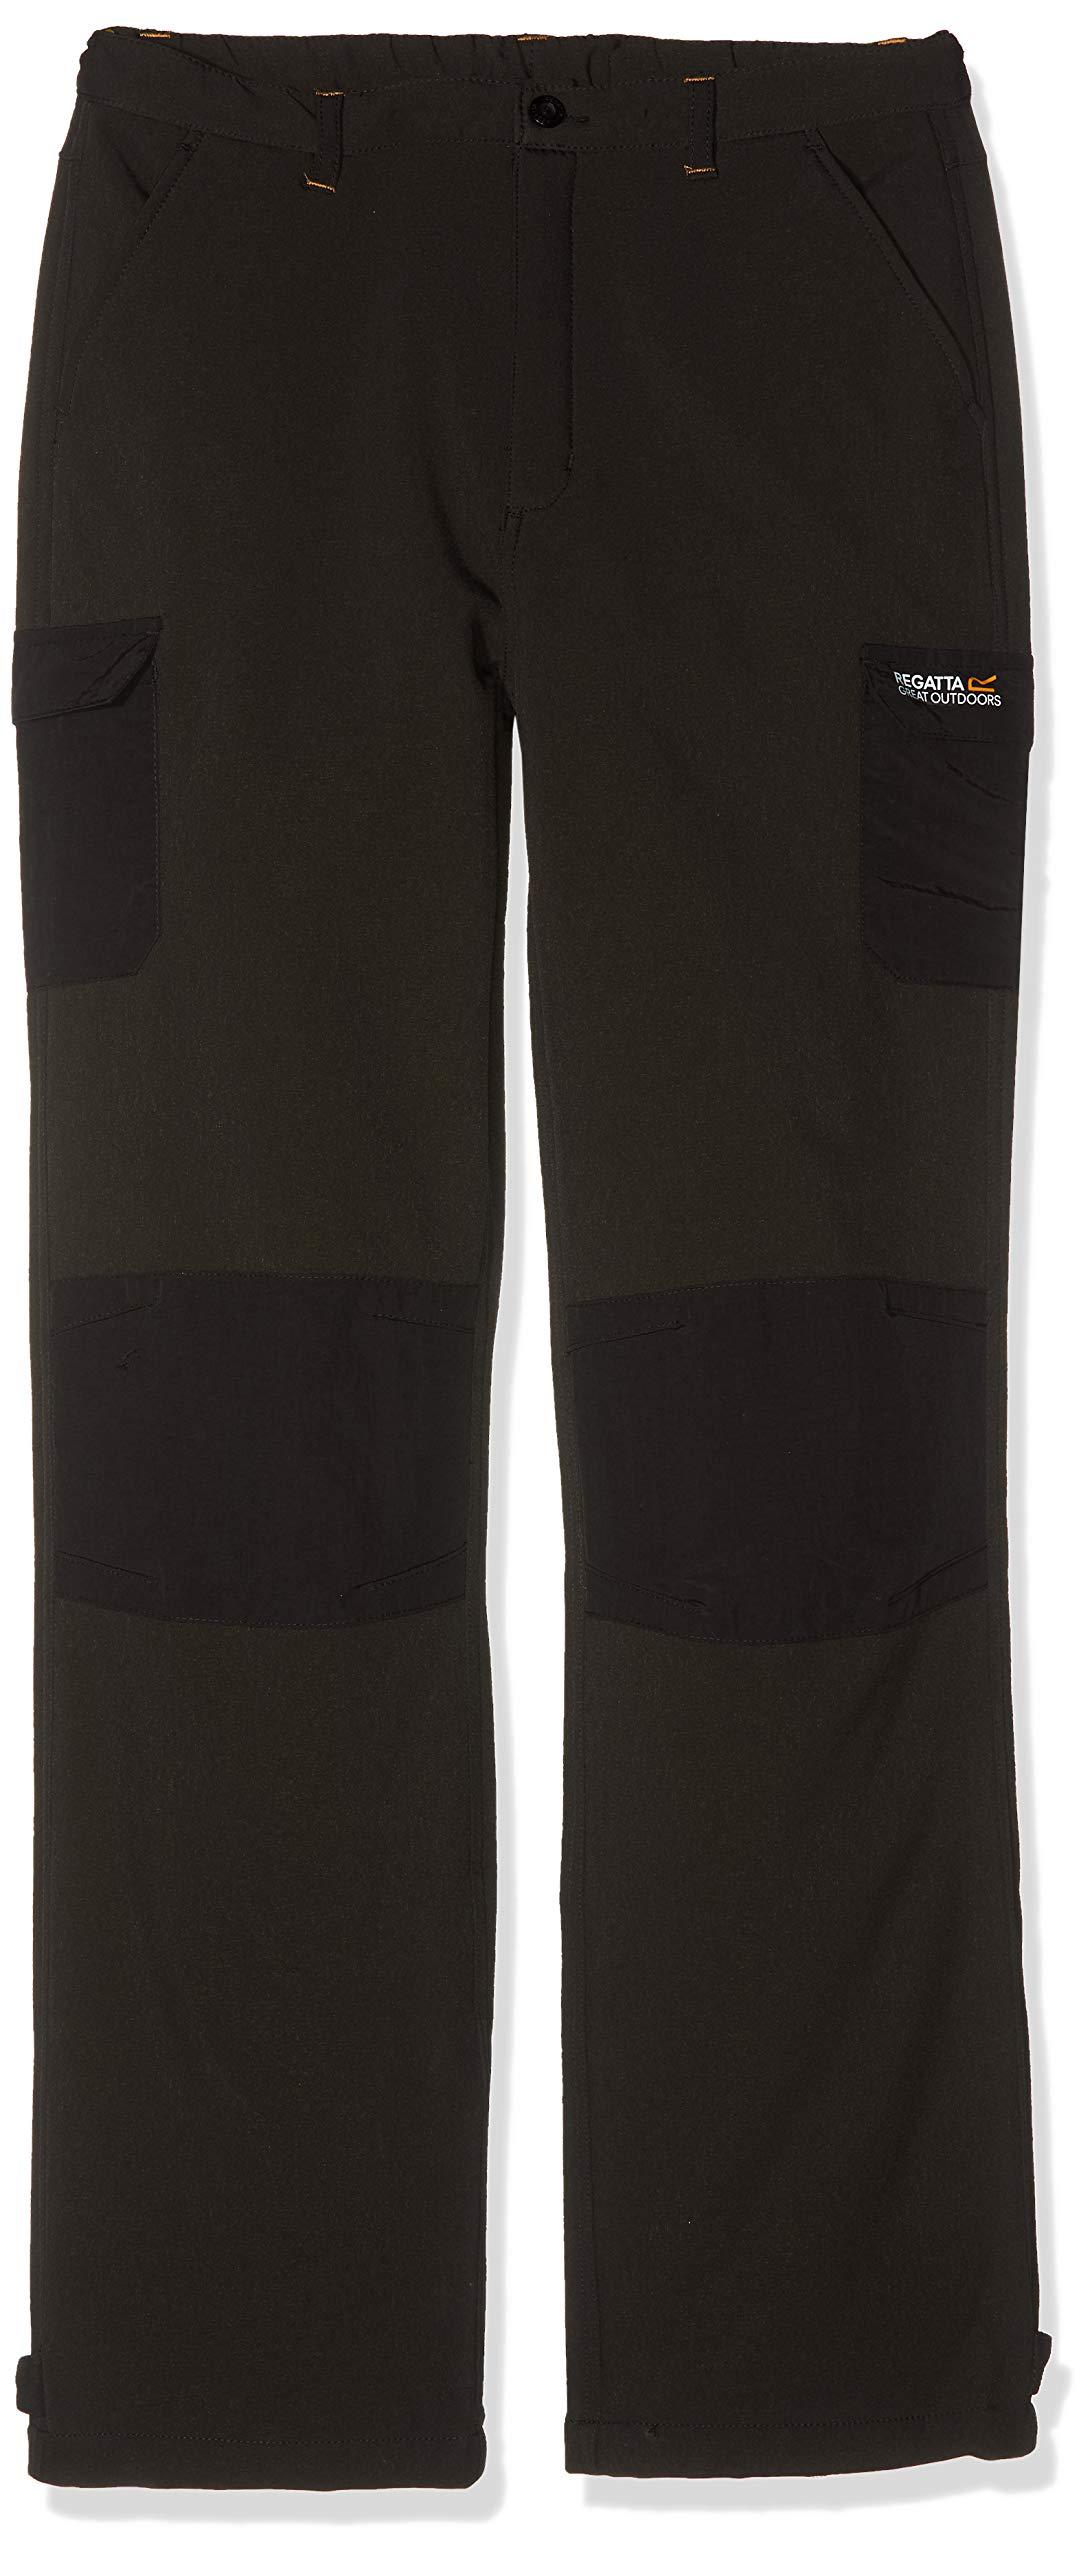 Regatta Winter Kinderhose, RKJ018, Schwarz, RKJ018 FR : L (Taille Fabricant : 11